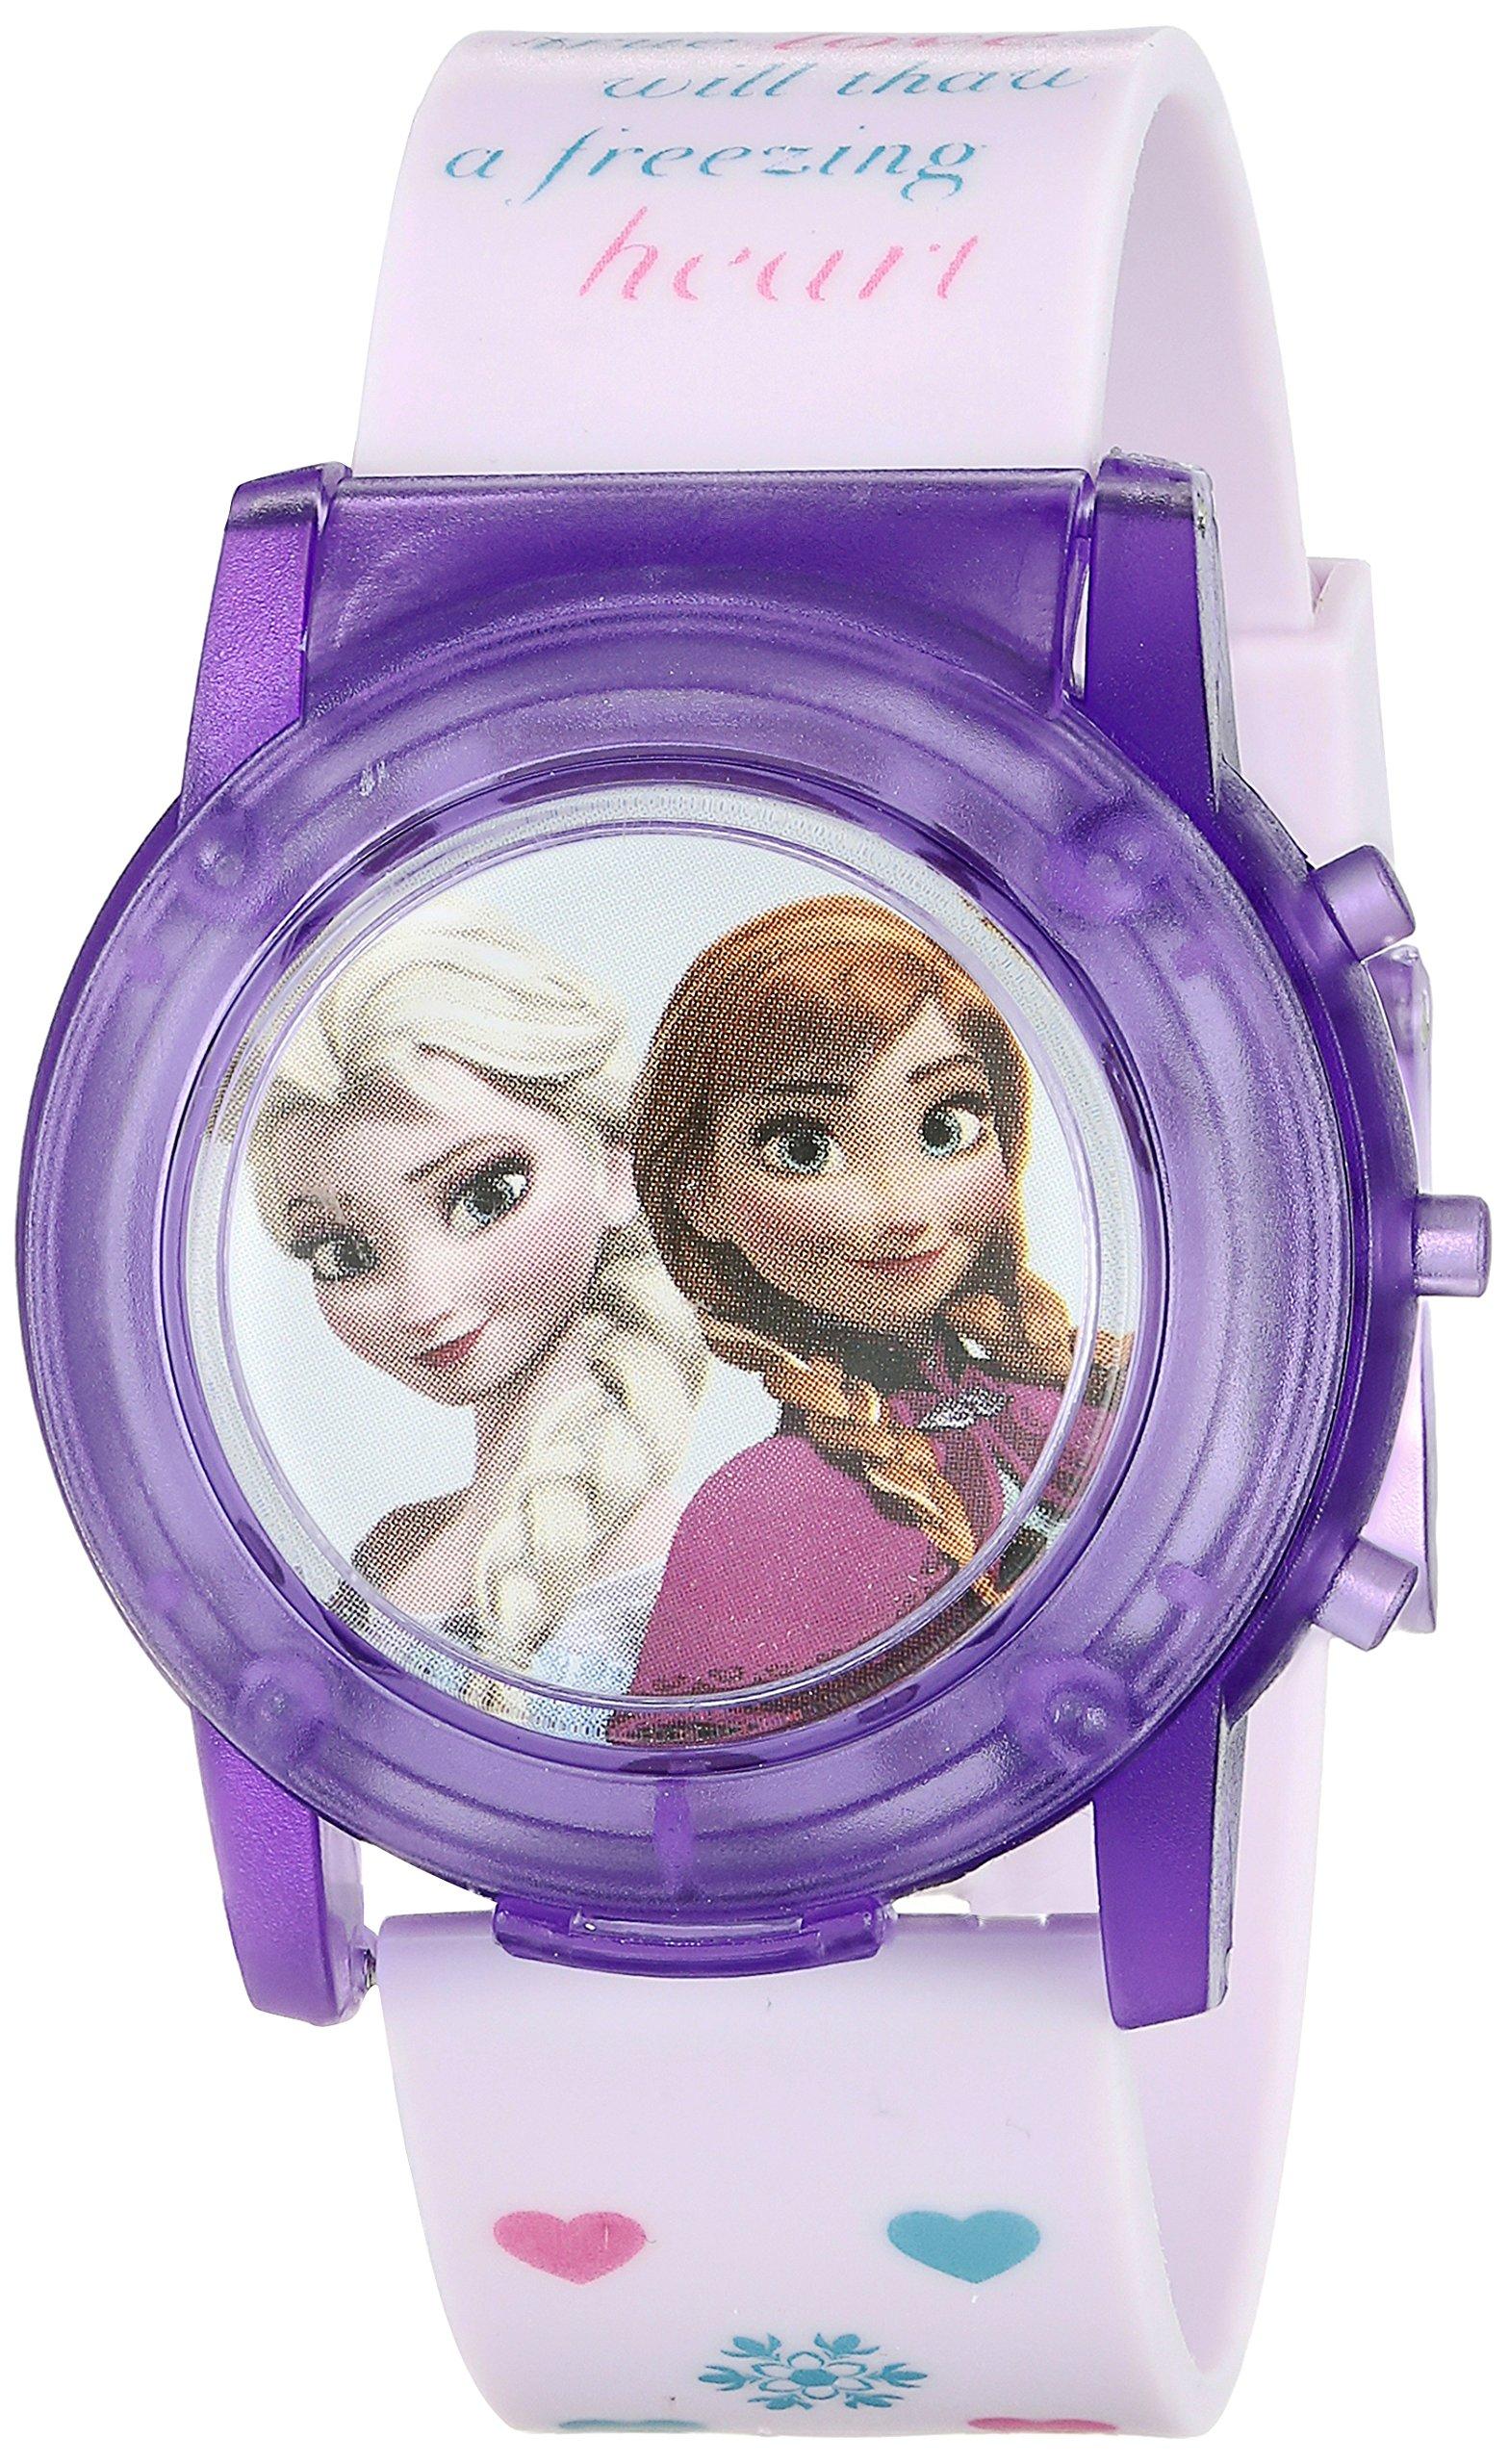 Disney Kids' FZN6000SR Digital Display Analog Quartz Pink Watch